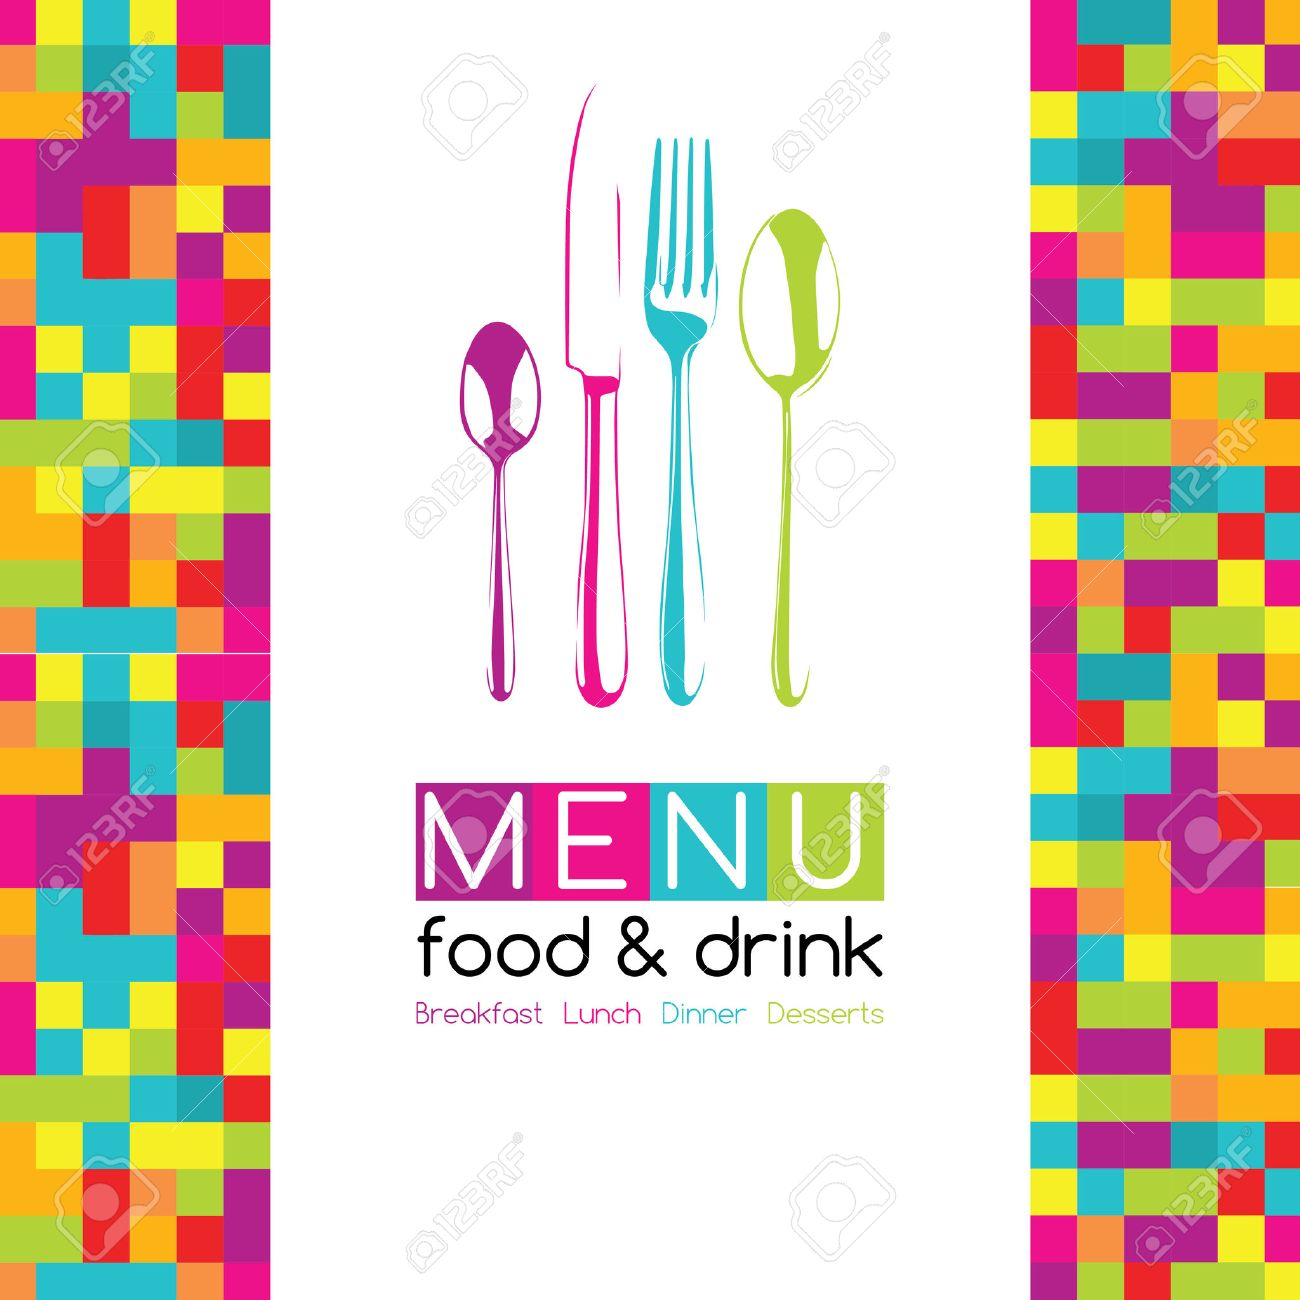 Restaurant Pop Art Pixel Menu Design - Food Drink - 50984388